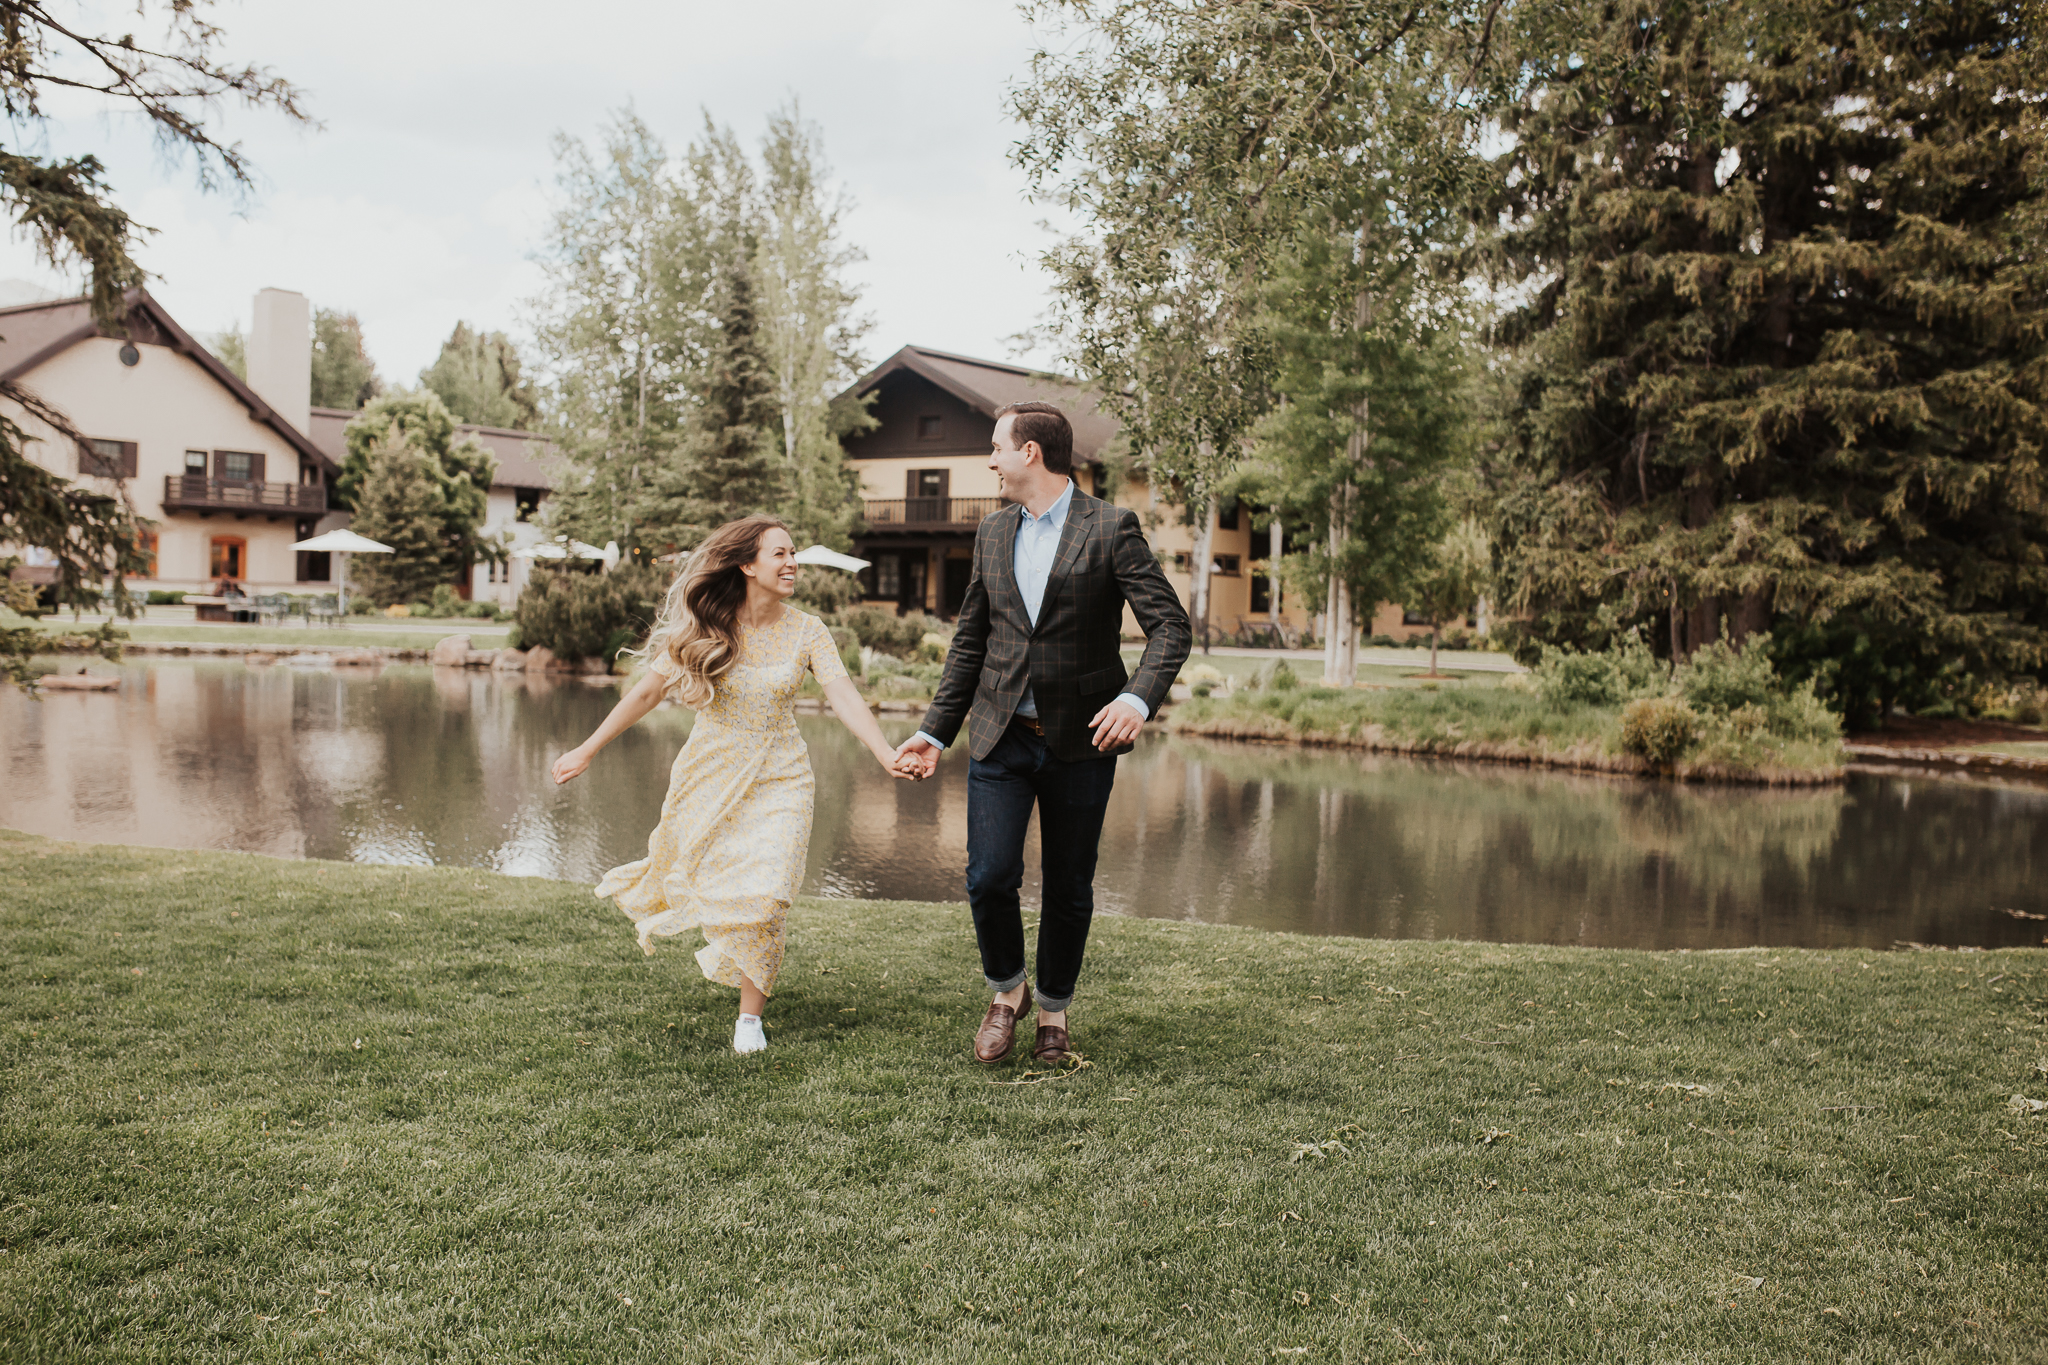 HannahJames_Engagement (10 of 27).jpg